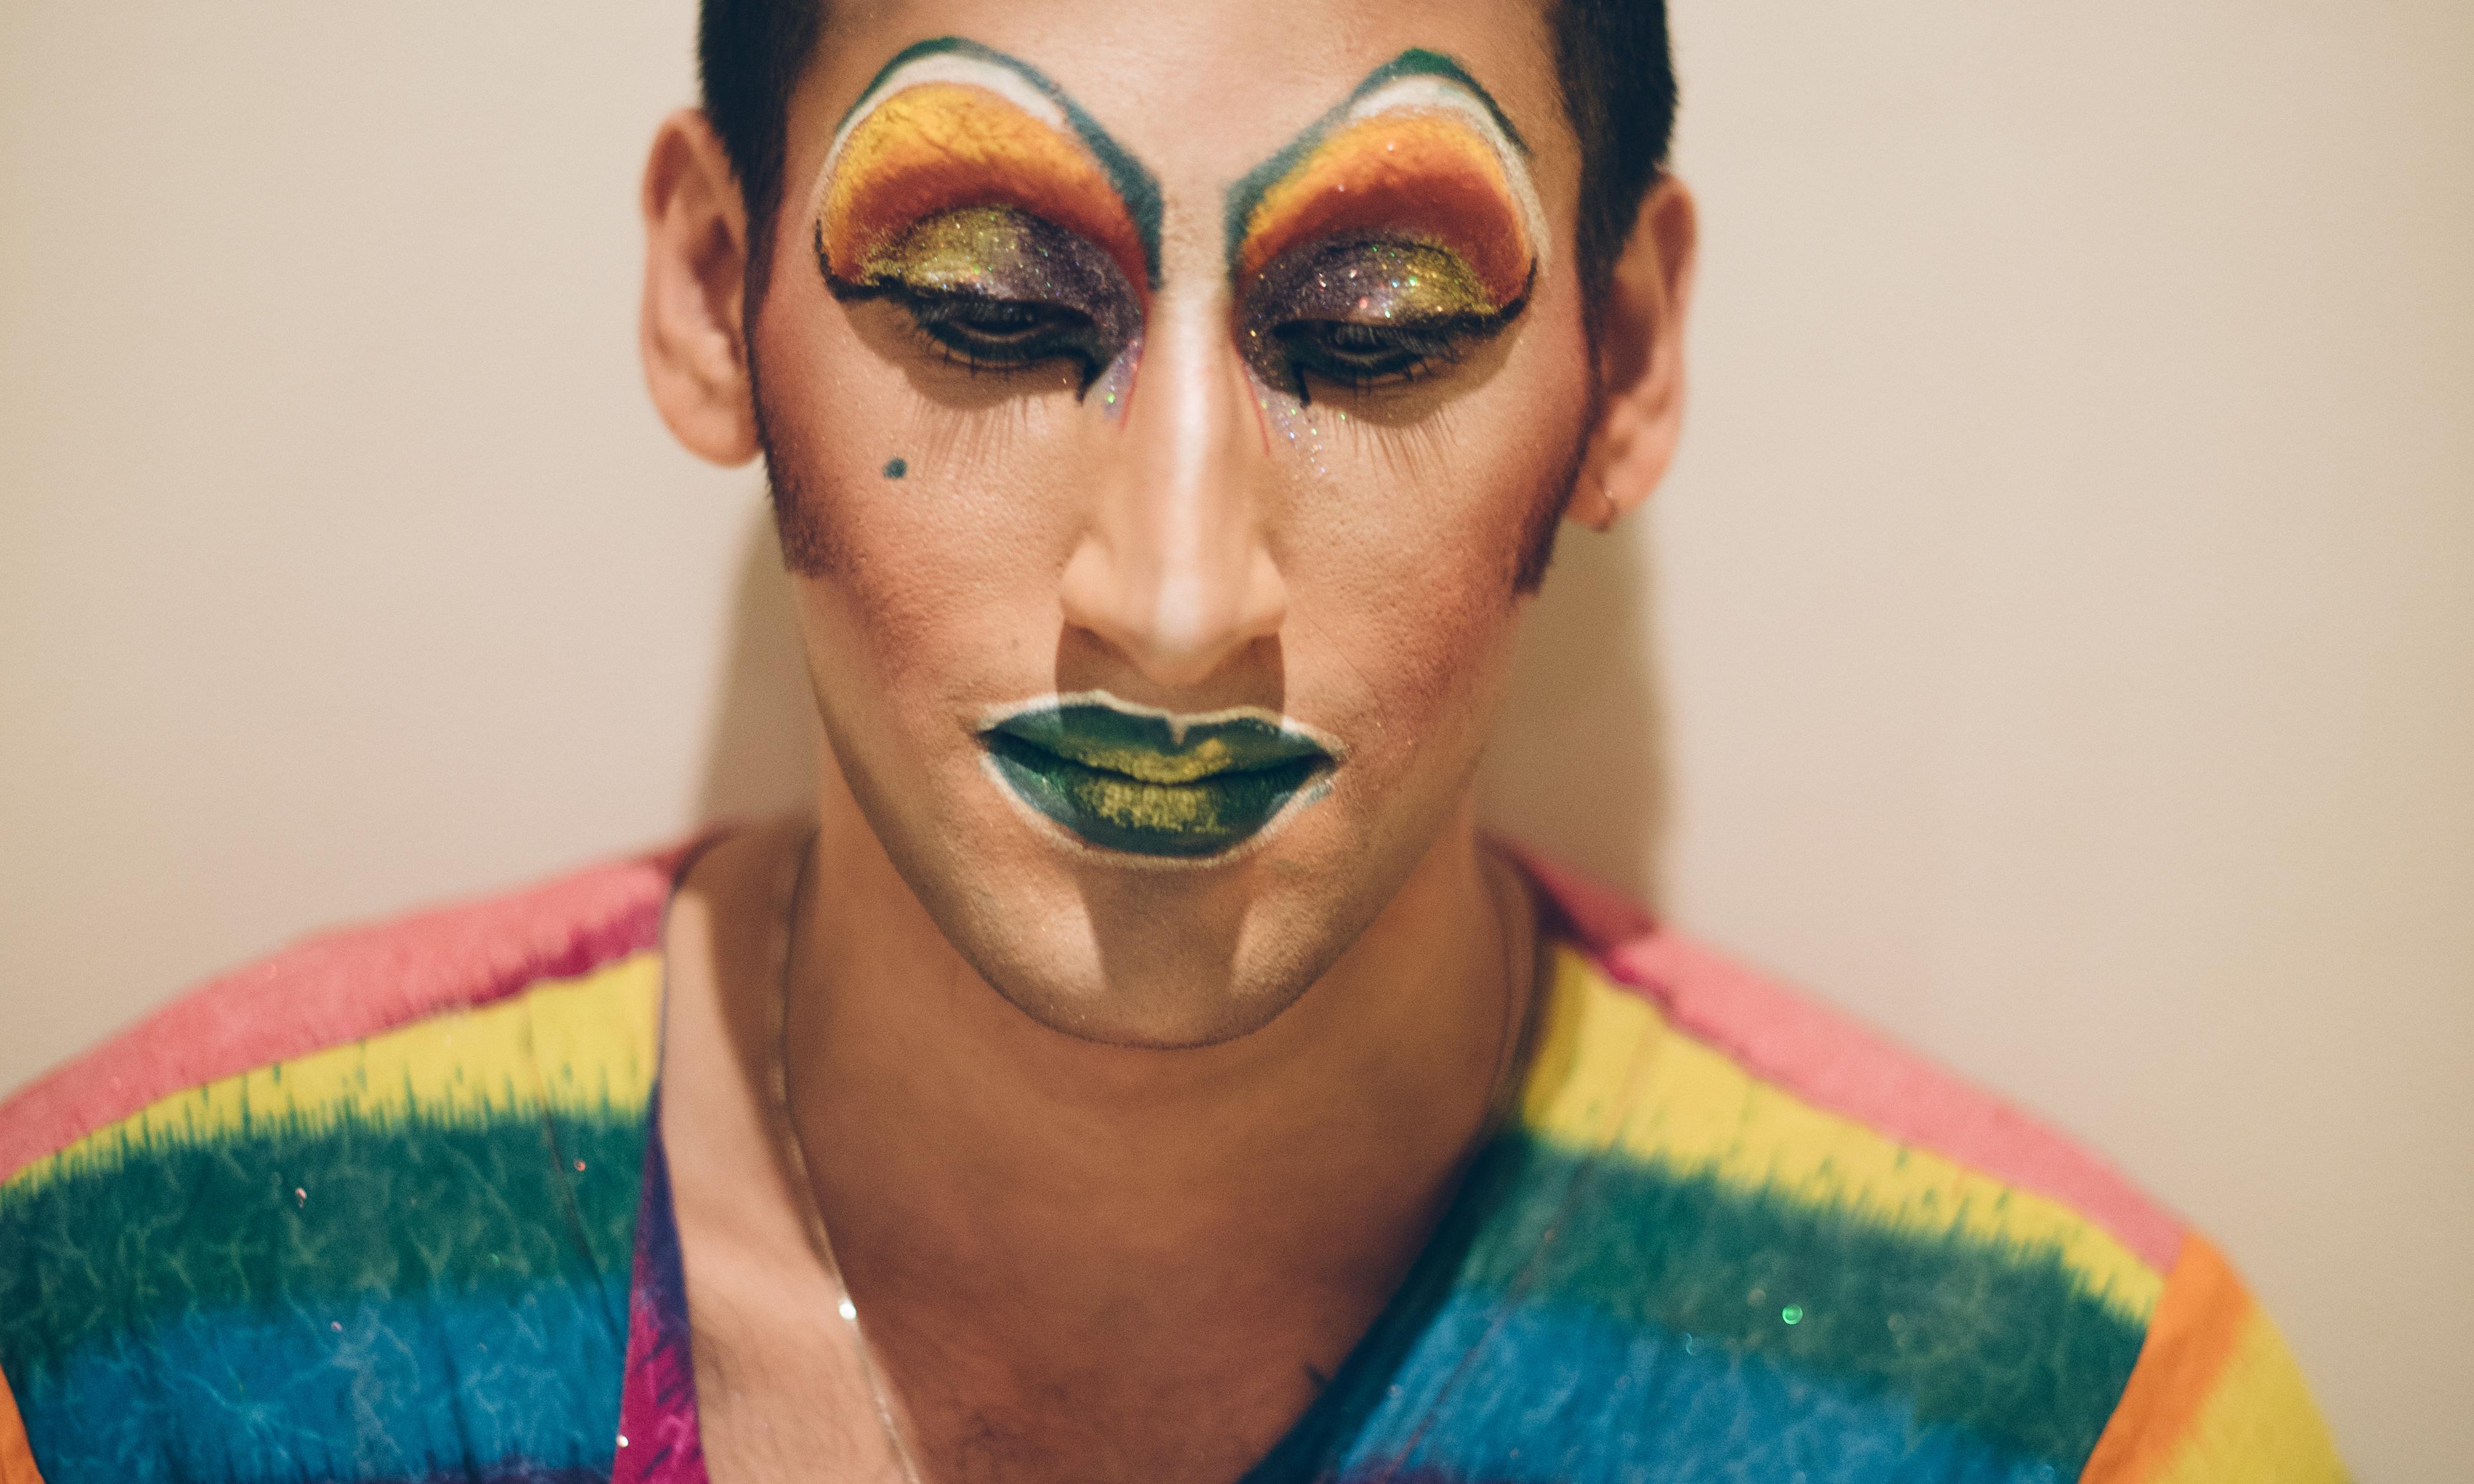 Amrou Al-Kadhi: 'Being a drag queen healed me'